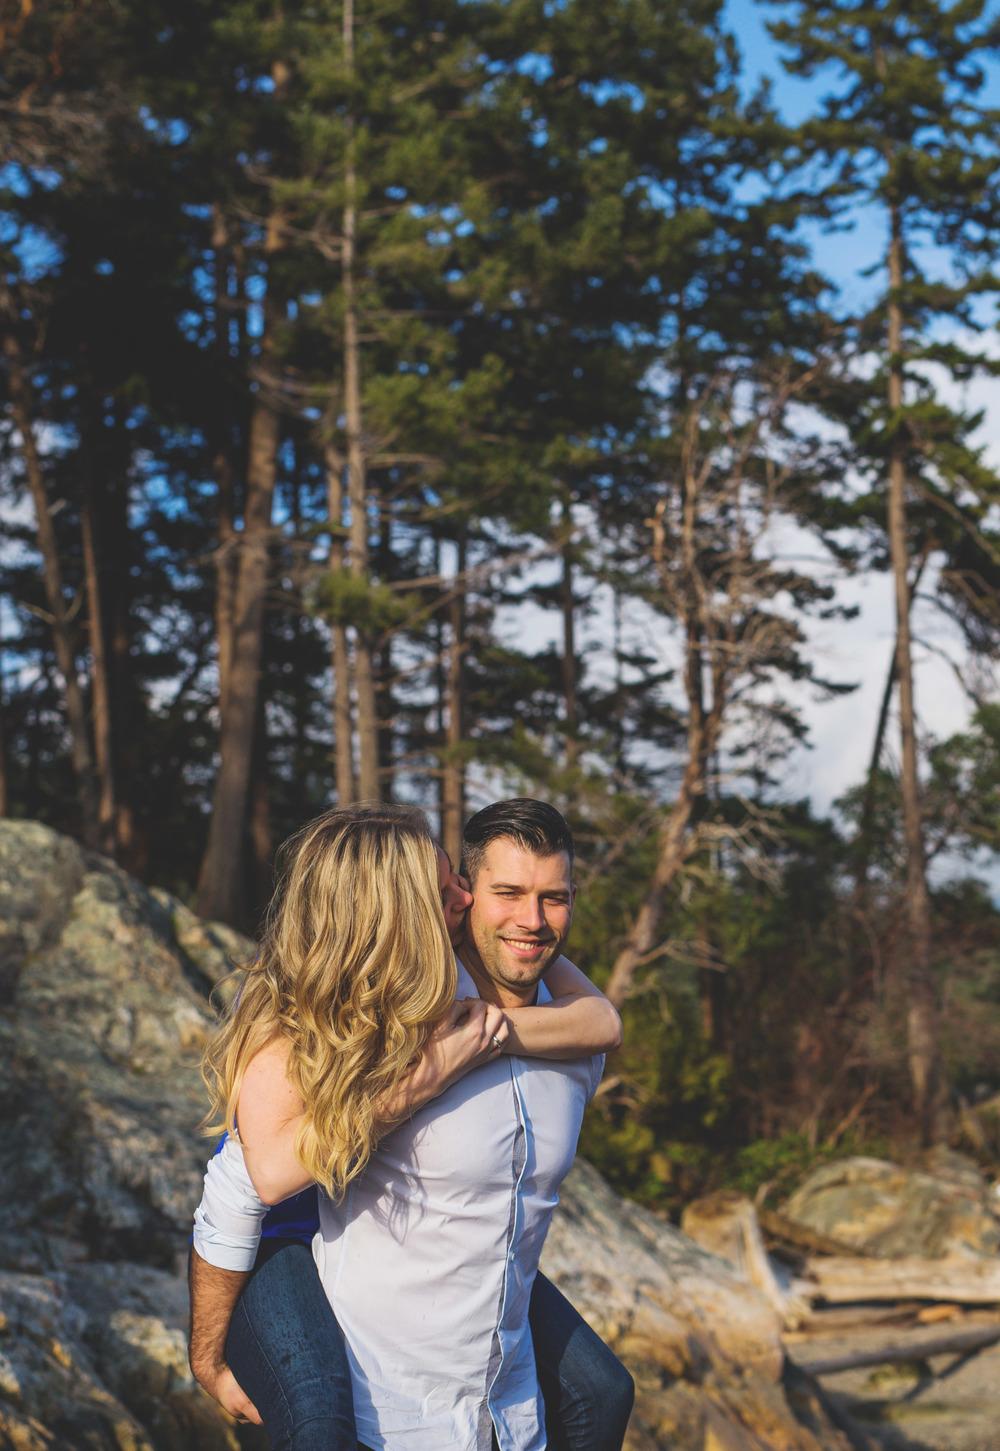 IMG_5248 JENNIFER PICARD PHOTOGRAPHY VANCOUVER WEDDING PHOTOGRAPHER.jpg